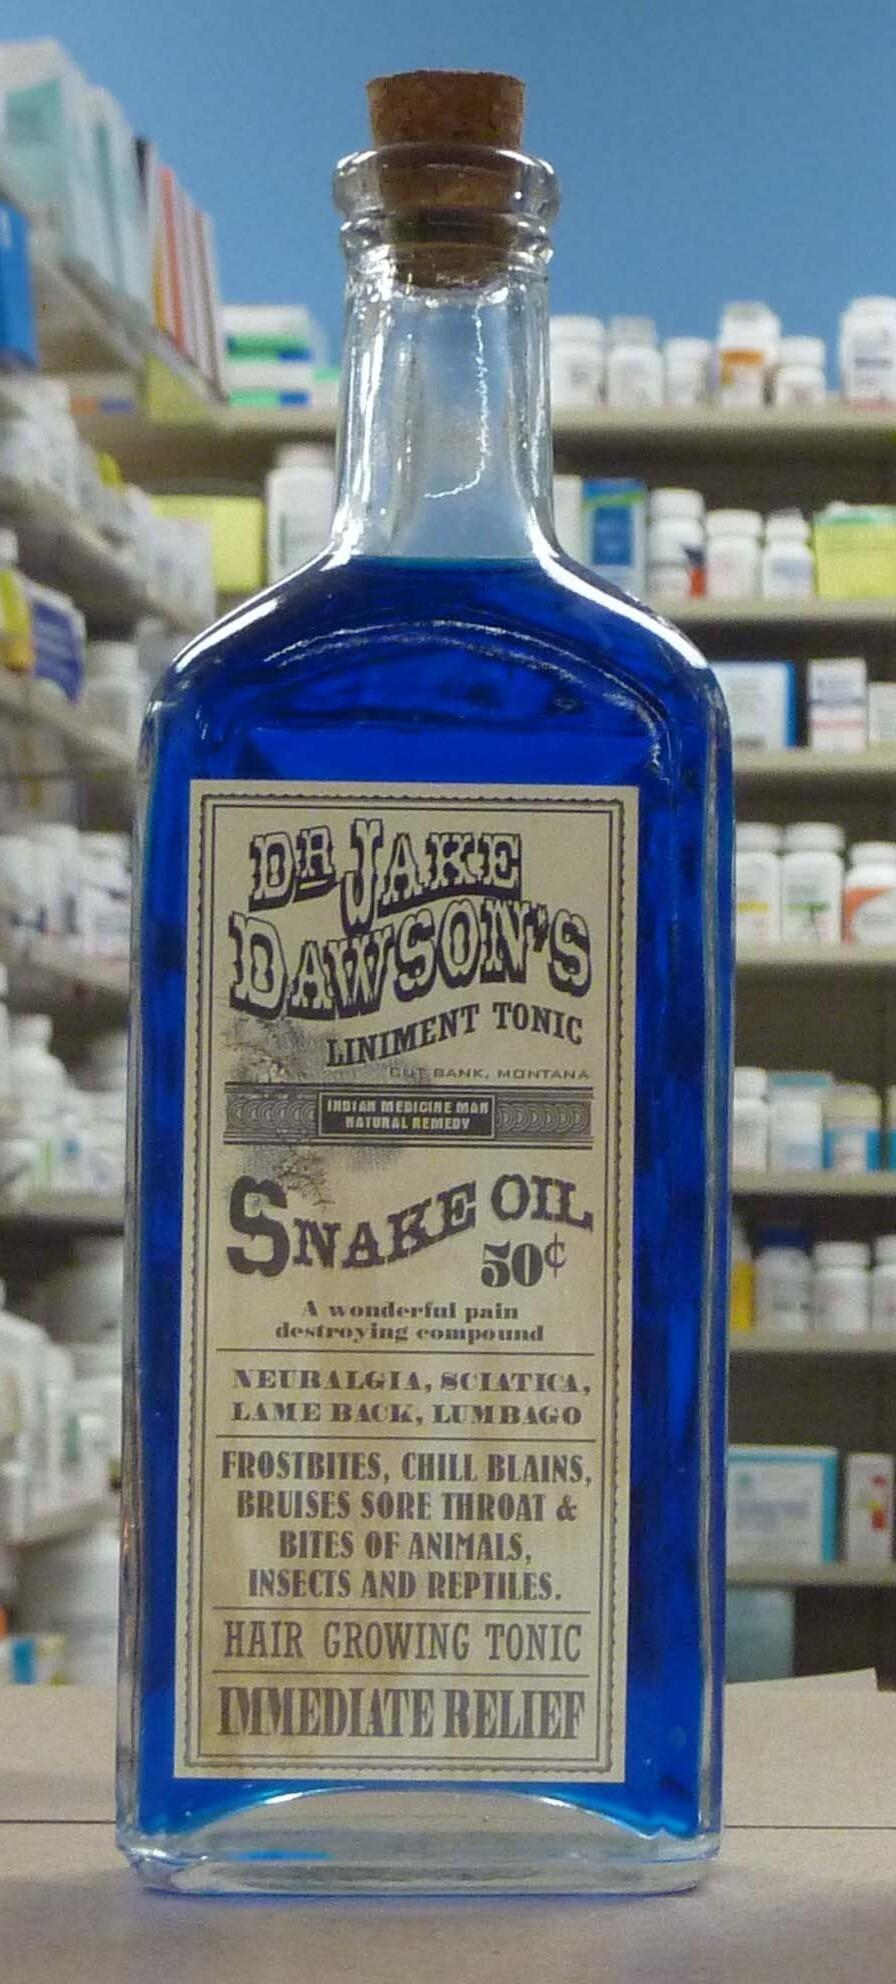 A History Of 'Snake Oi...